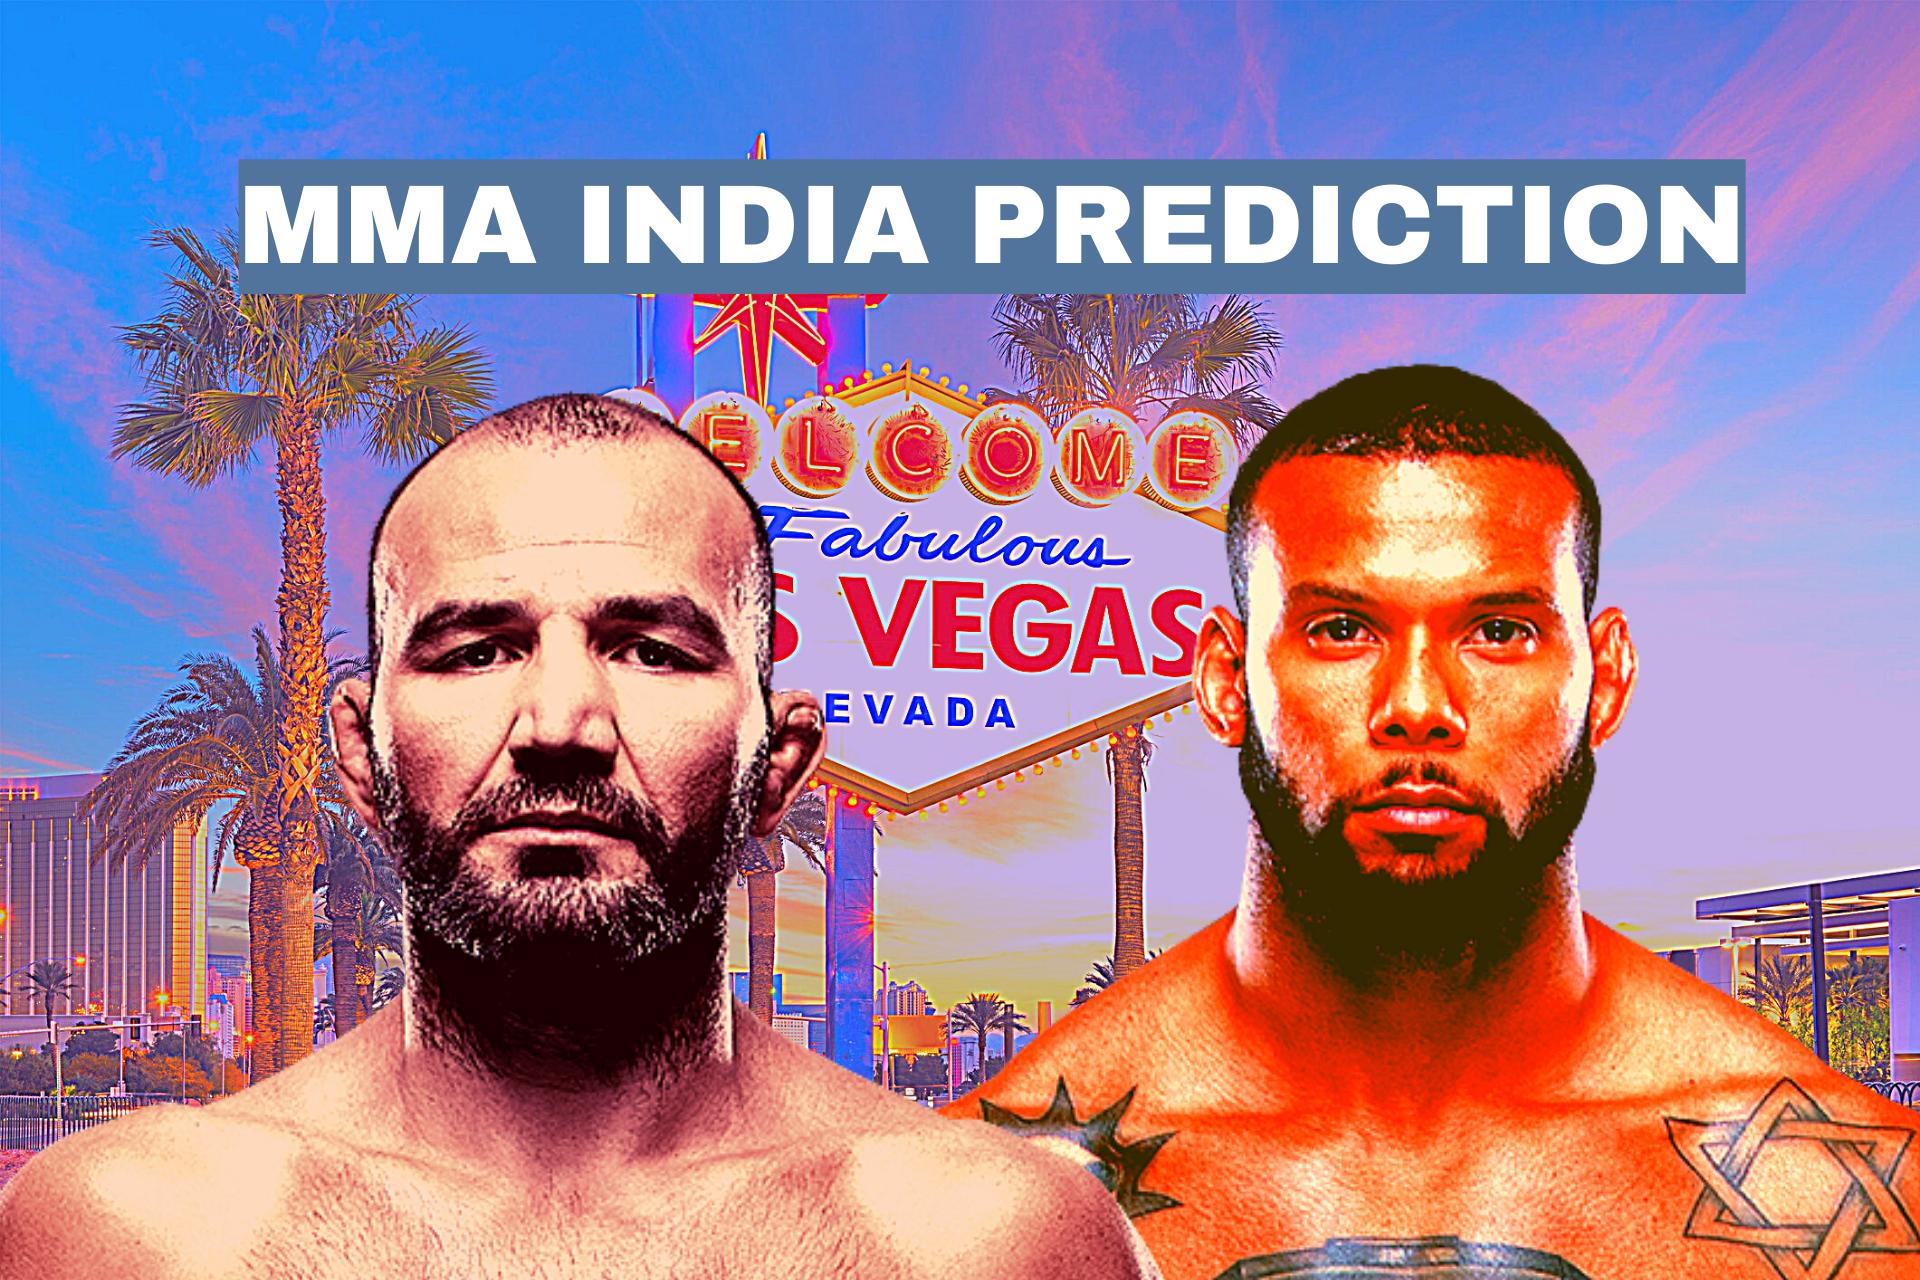 UFC Vegas 13: Santos vs Teixeira Odds, Prediction, Verdict - Santos